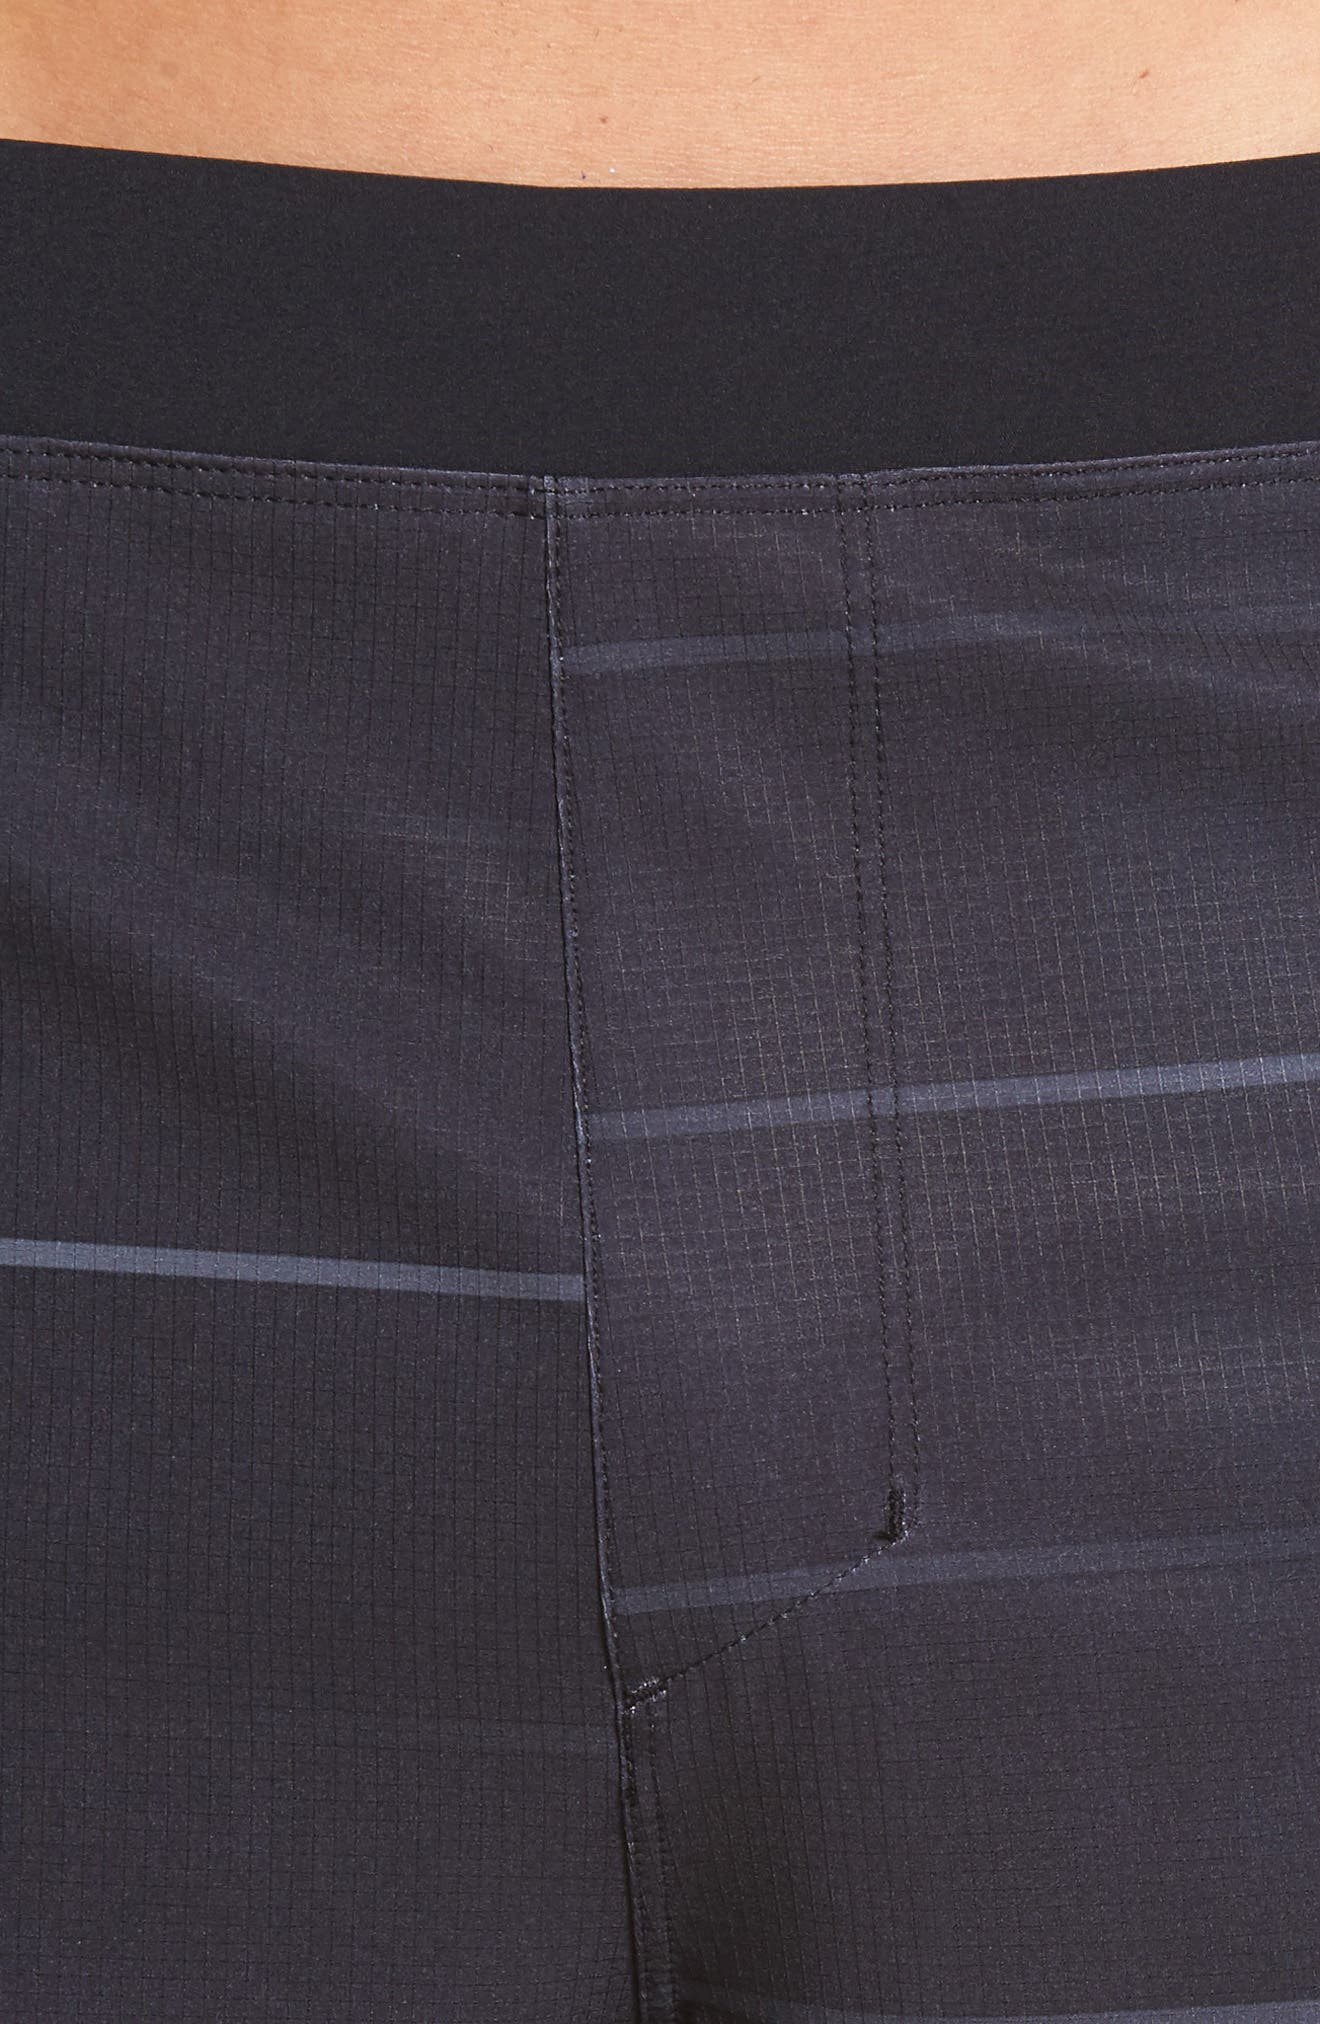 Alpha Trainer Stripe Shorts,                             Alternate thumbnail 4, color,                             010